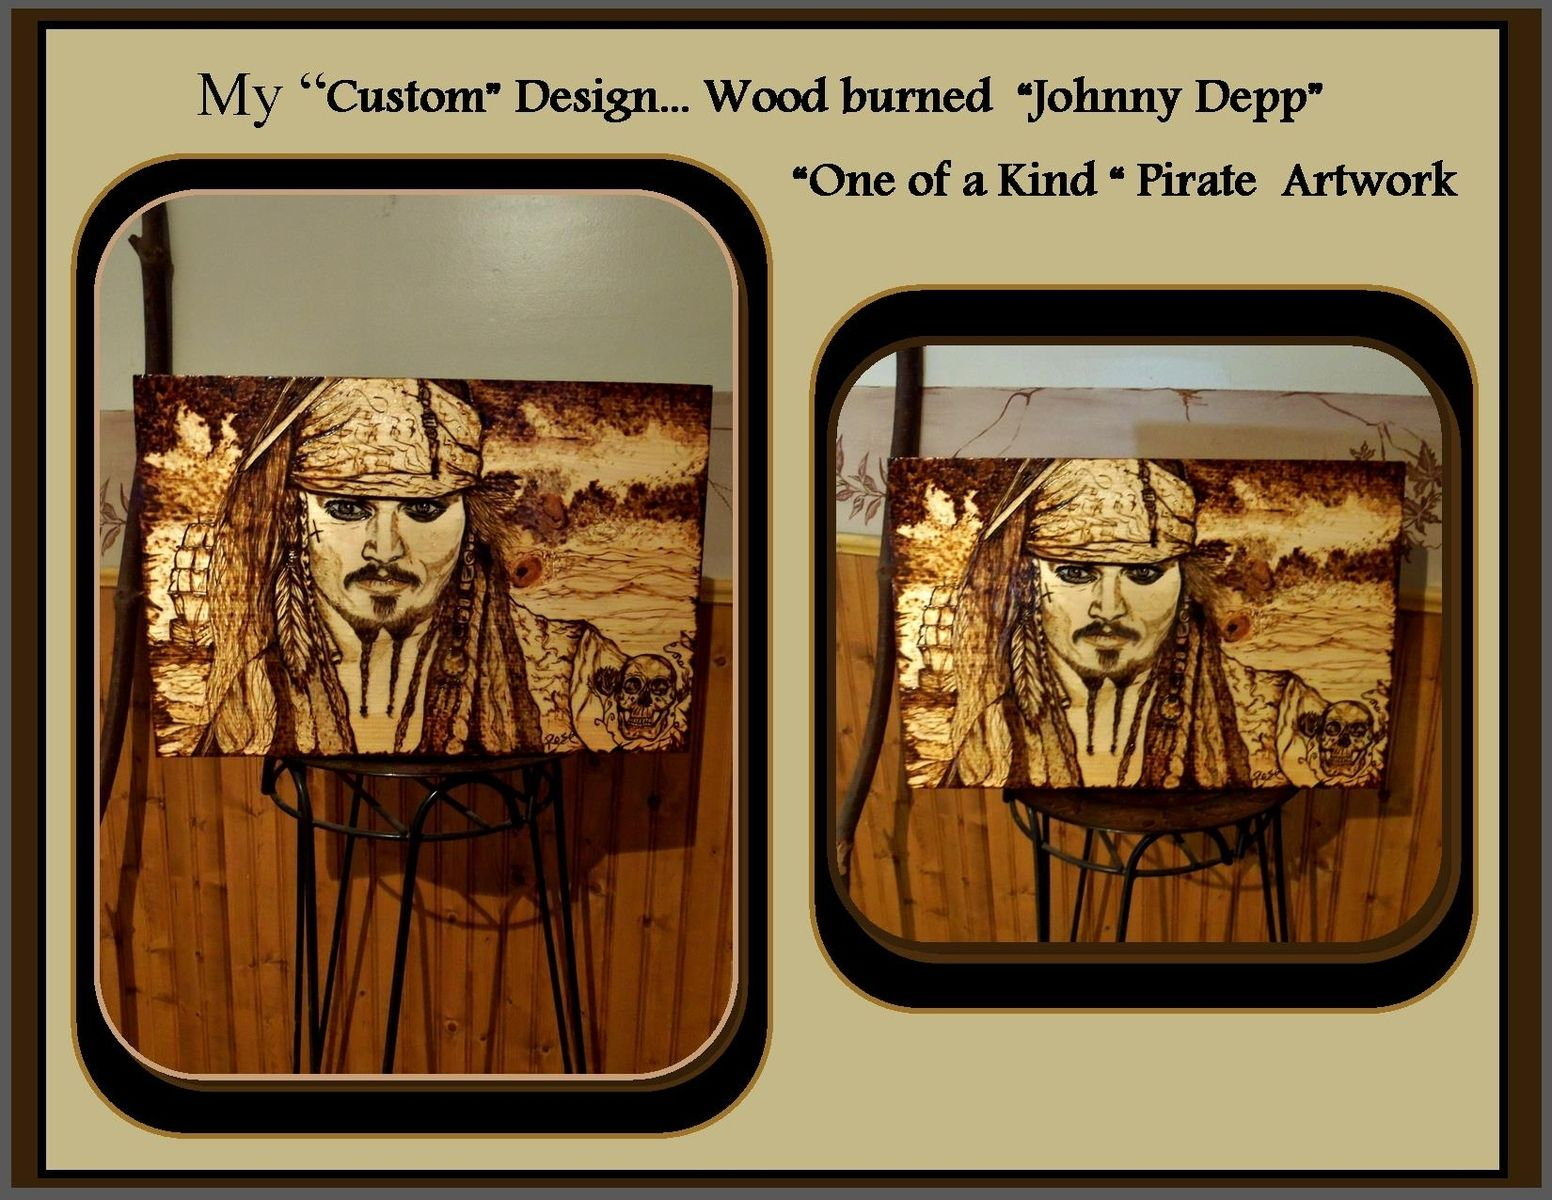 Man Caves Pirate Episode : Buy custom johnny depp pirates of the carribbean art